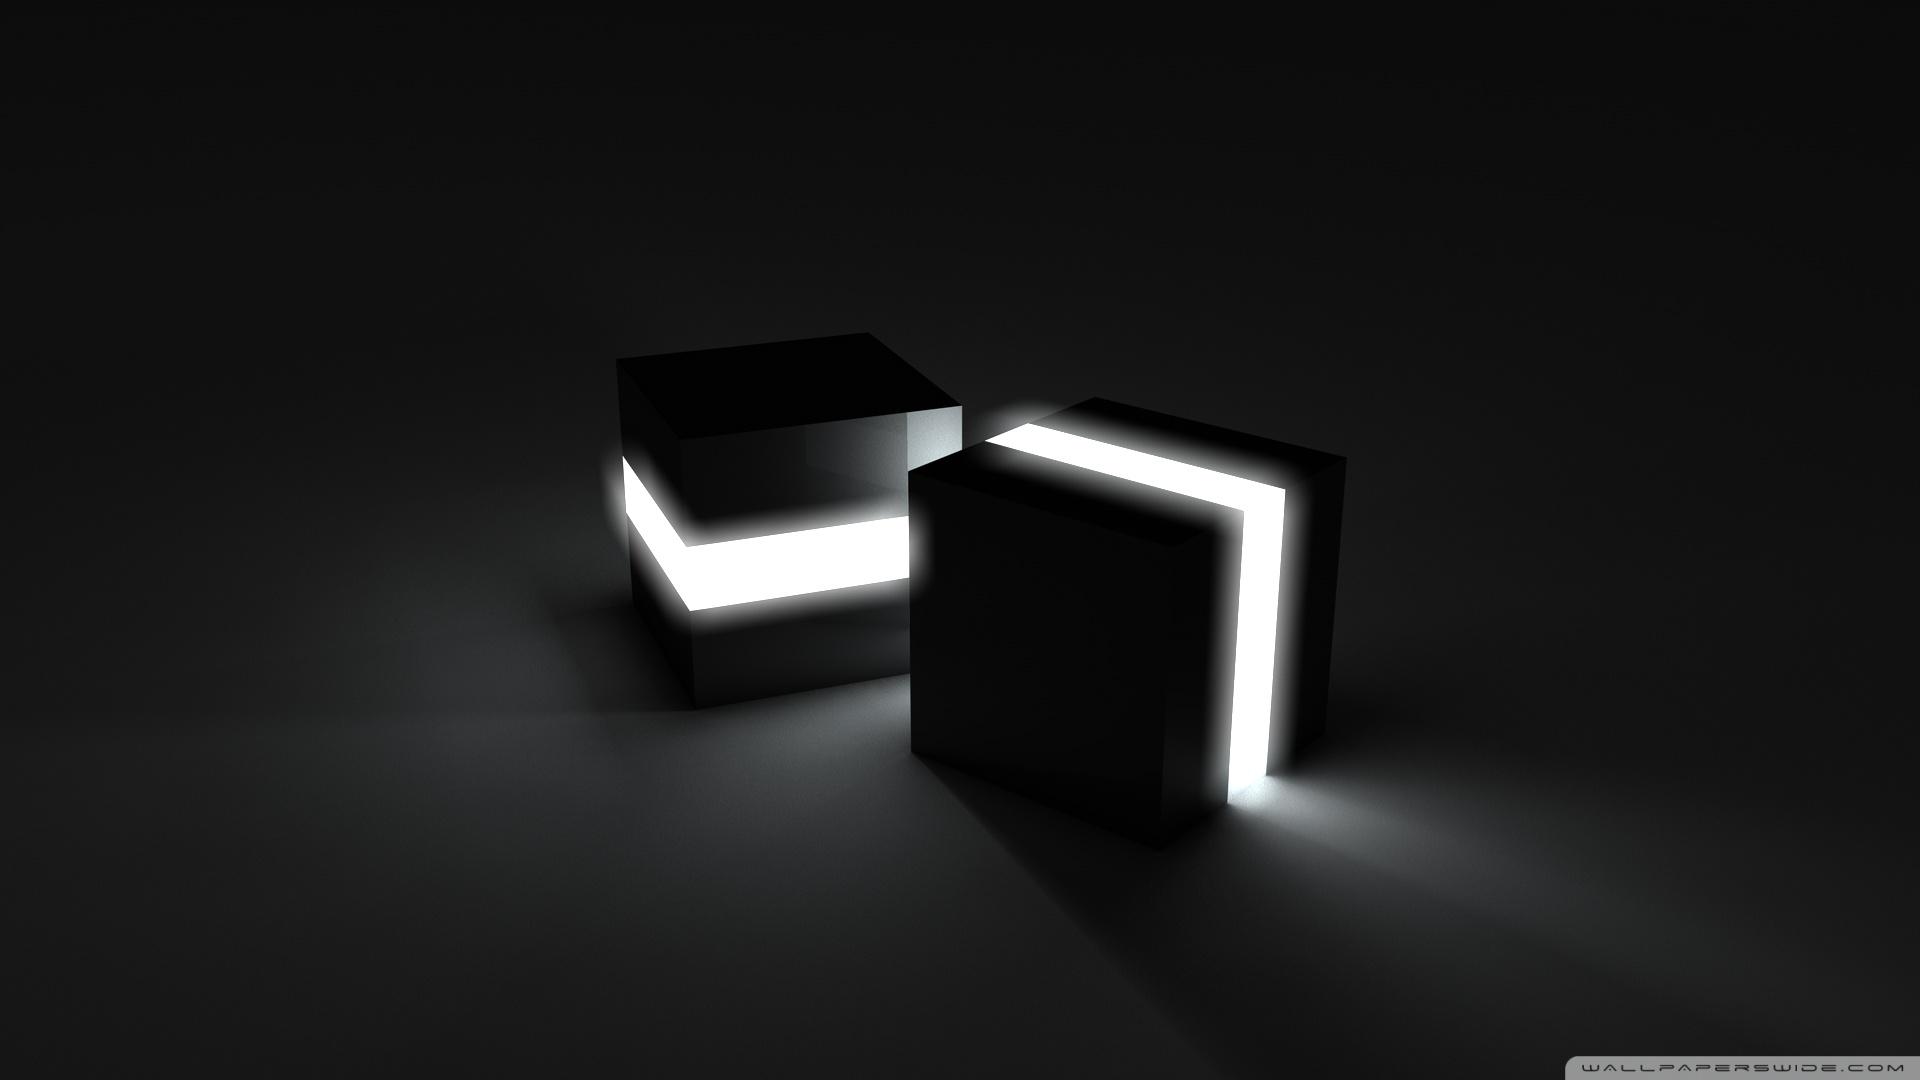 Black Cubes 2 Wallpaper 1920x1080 Black Cubes 2 1920x1080